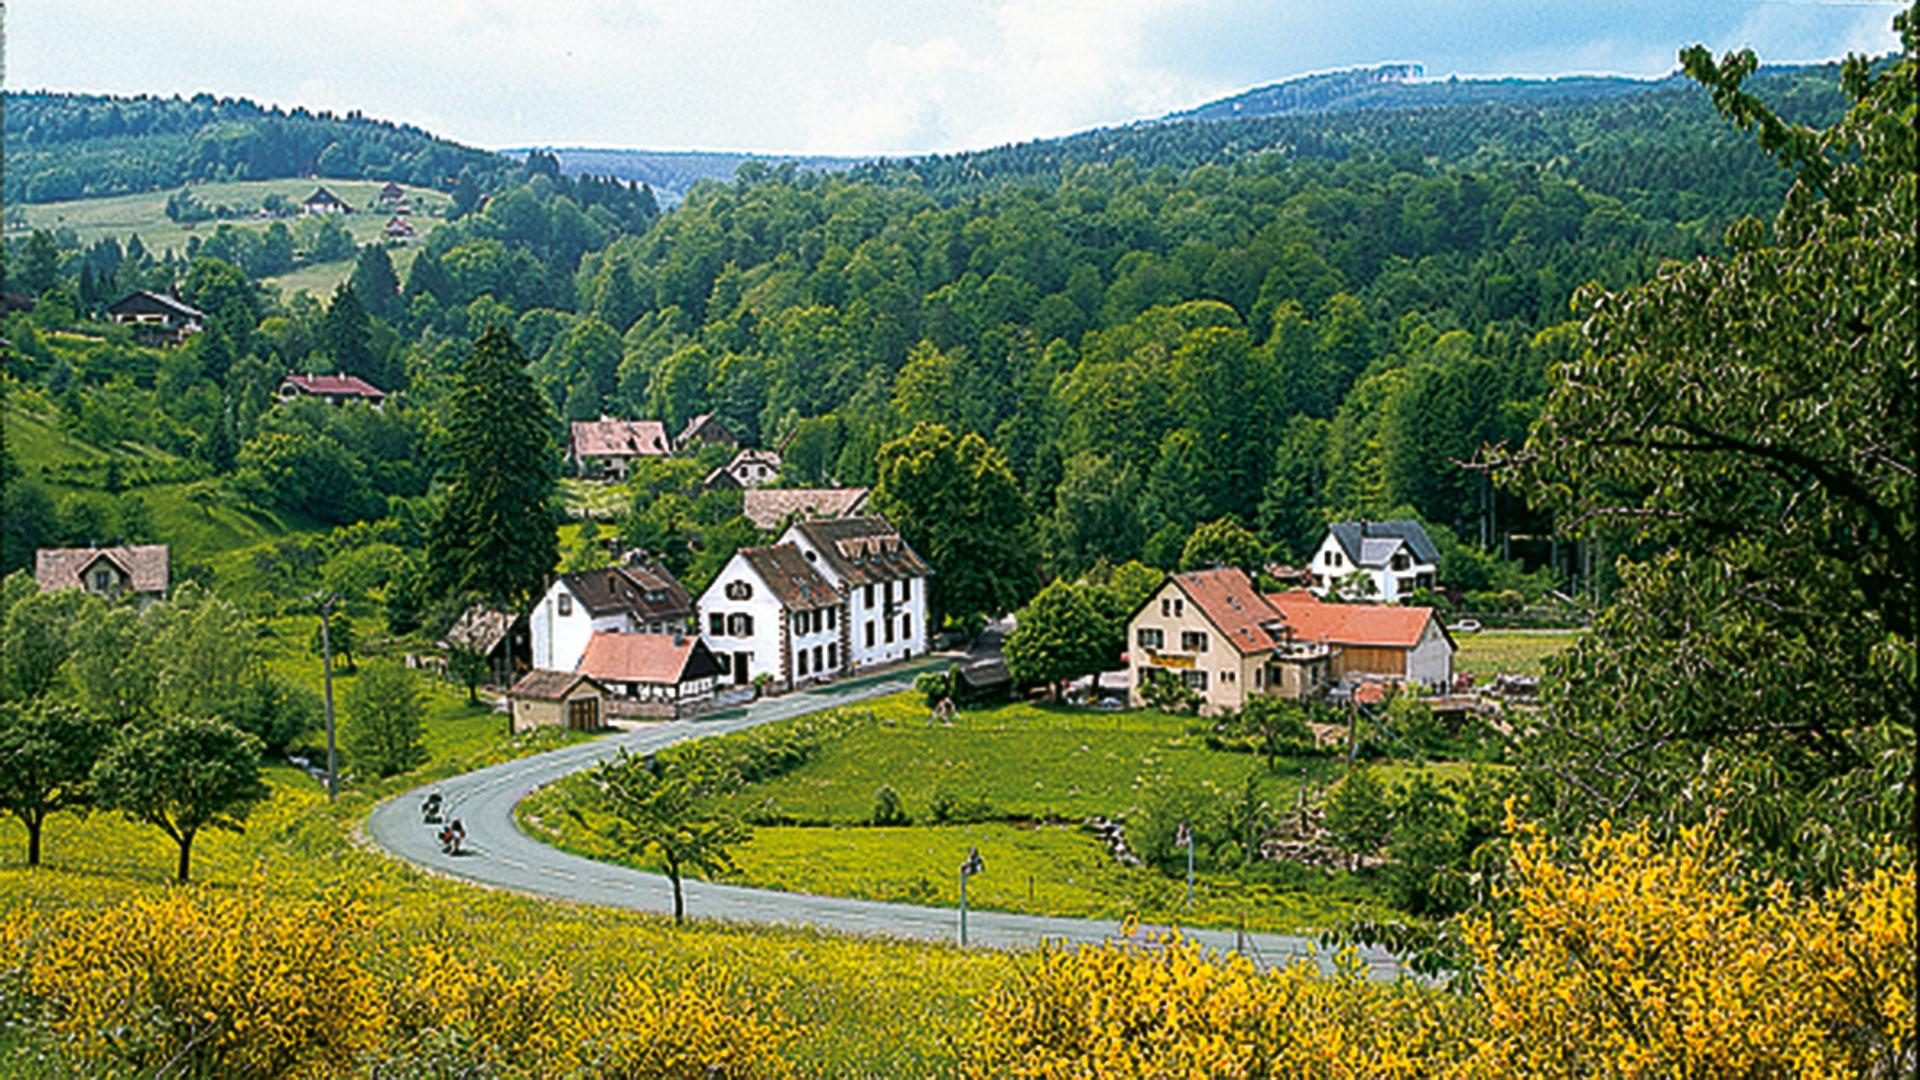 Bitschwiller-les-Thann